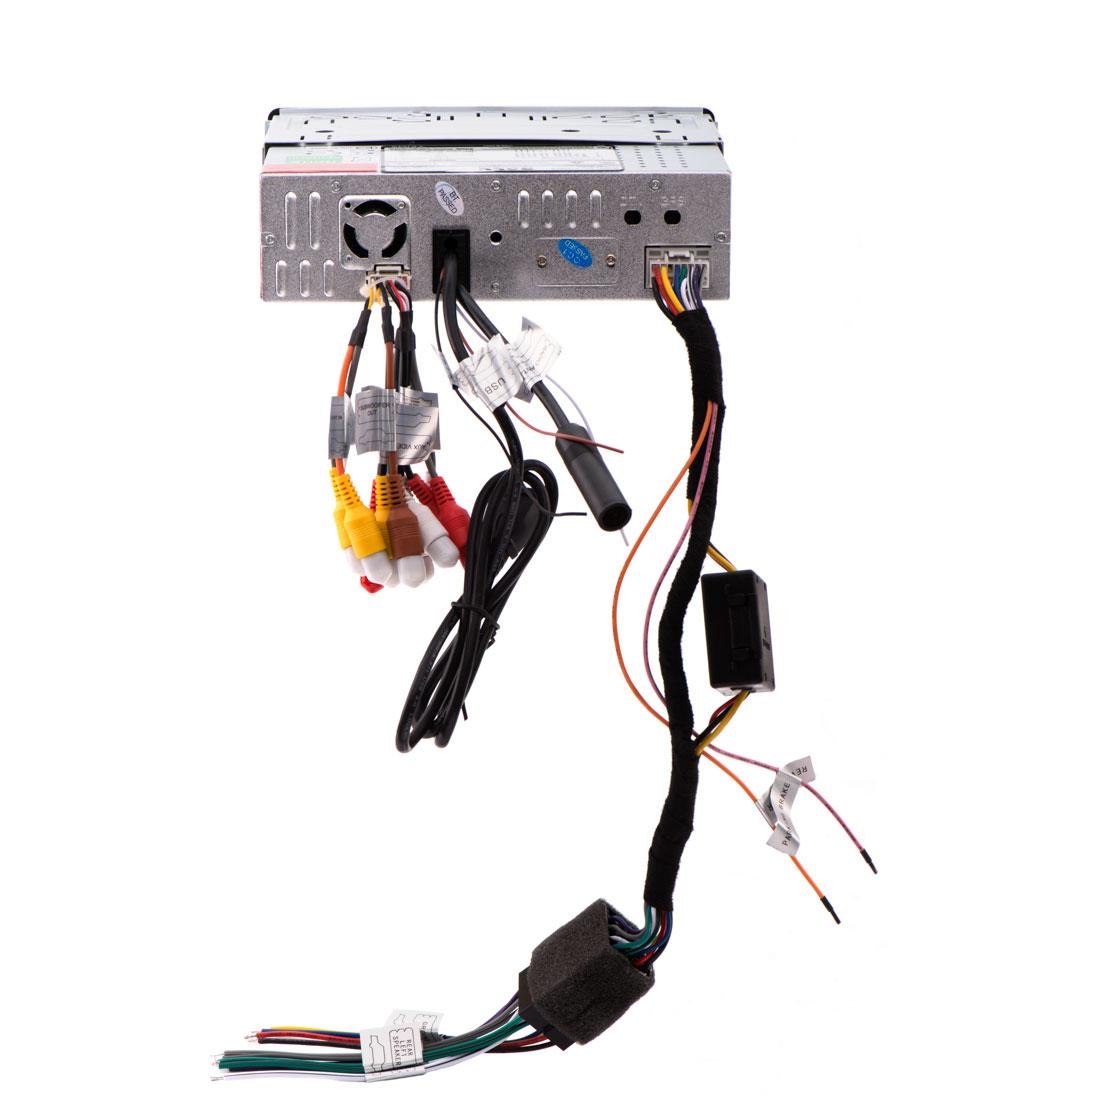 hight resolution of  boss audio bvb9967rc on boss bv 9755 review boss bv9967bi wiring diagram